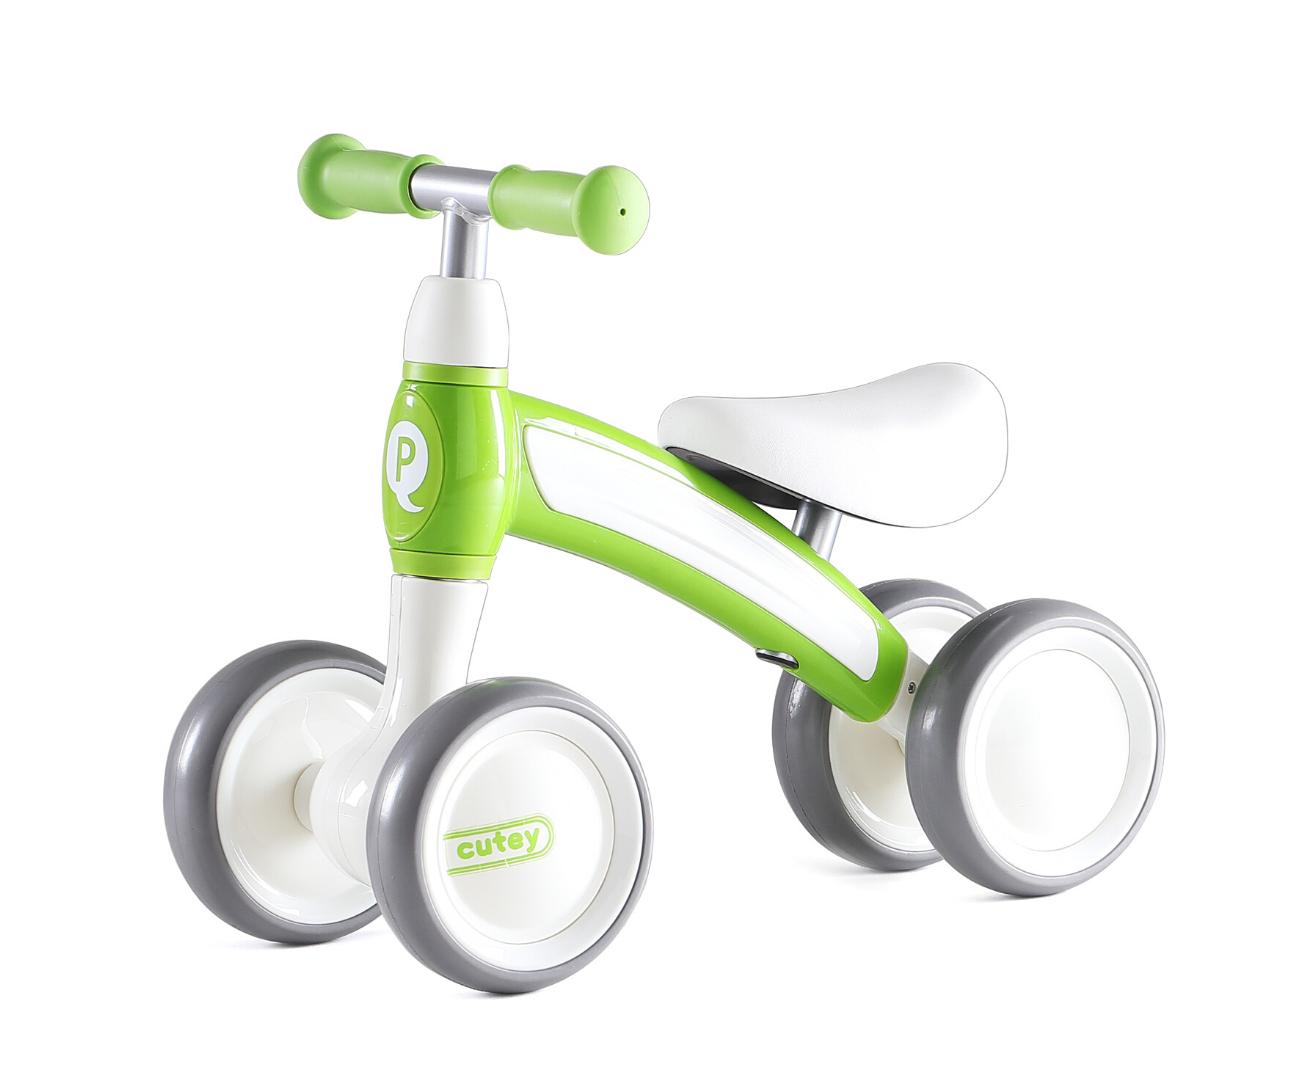 Qplay sõiduk Cutey Green